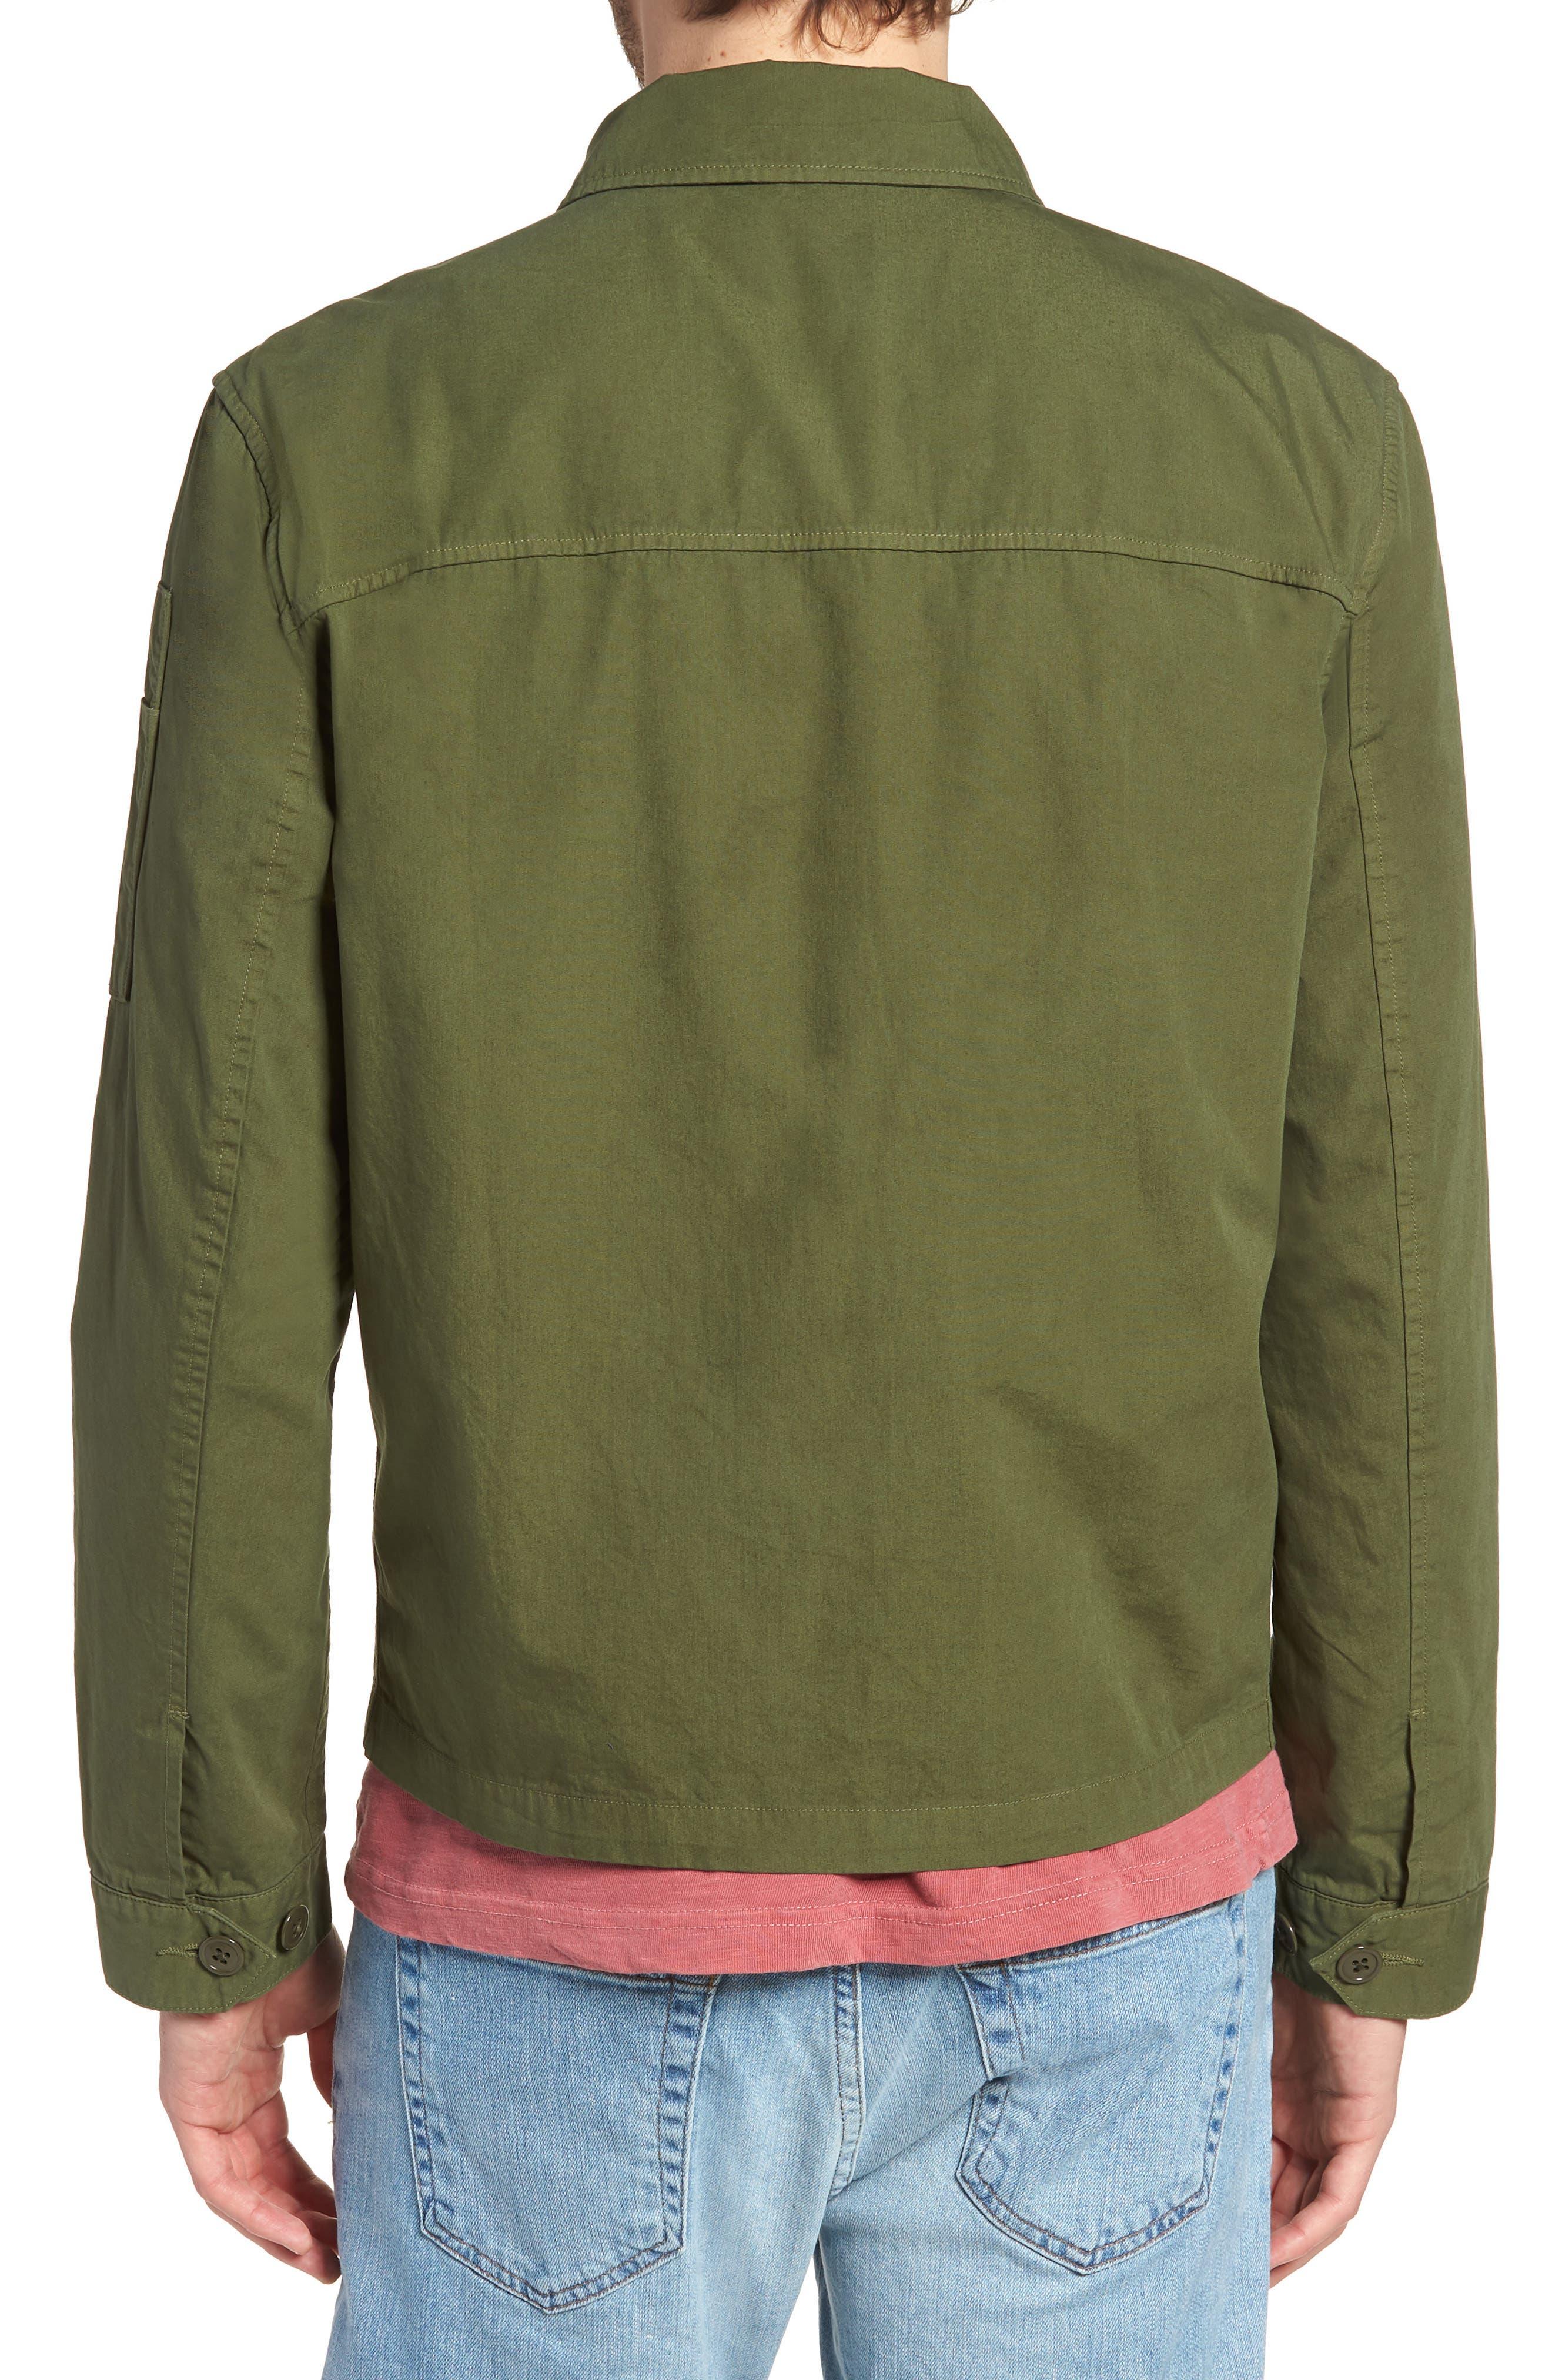 Four-Pocket Utility Jacket,                             Alternate thumbnail 2, color,                             300